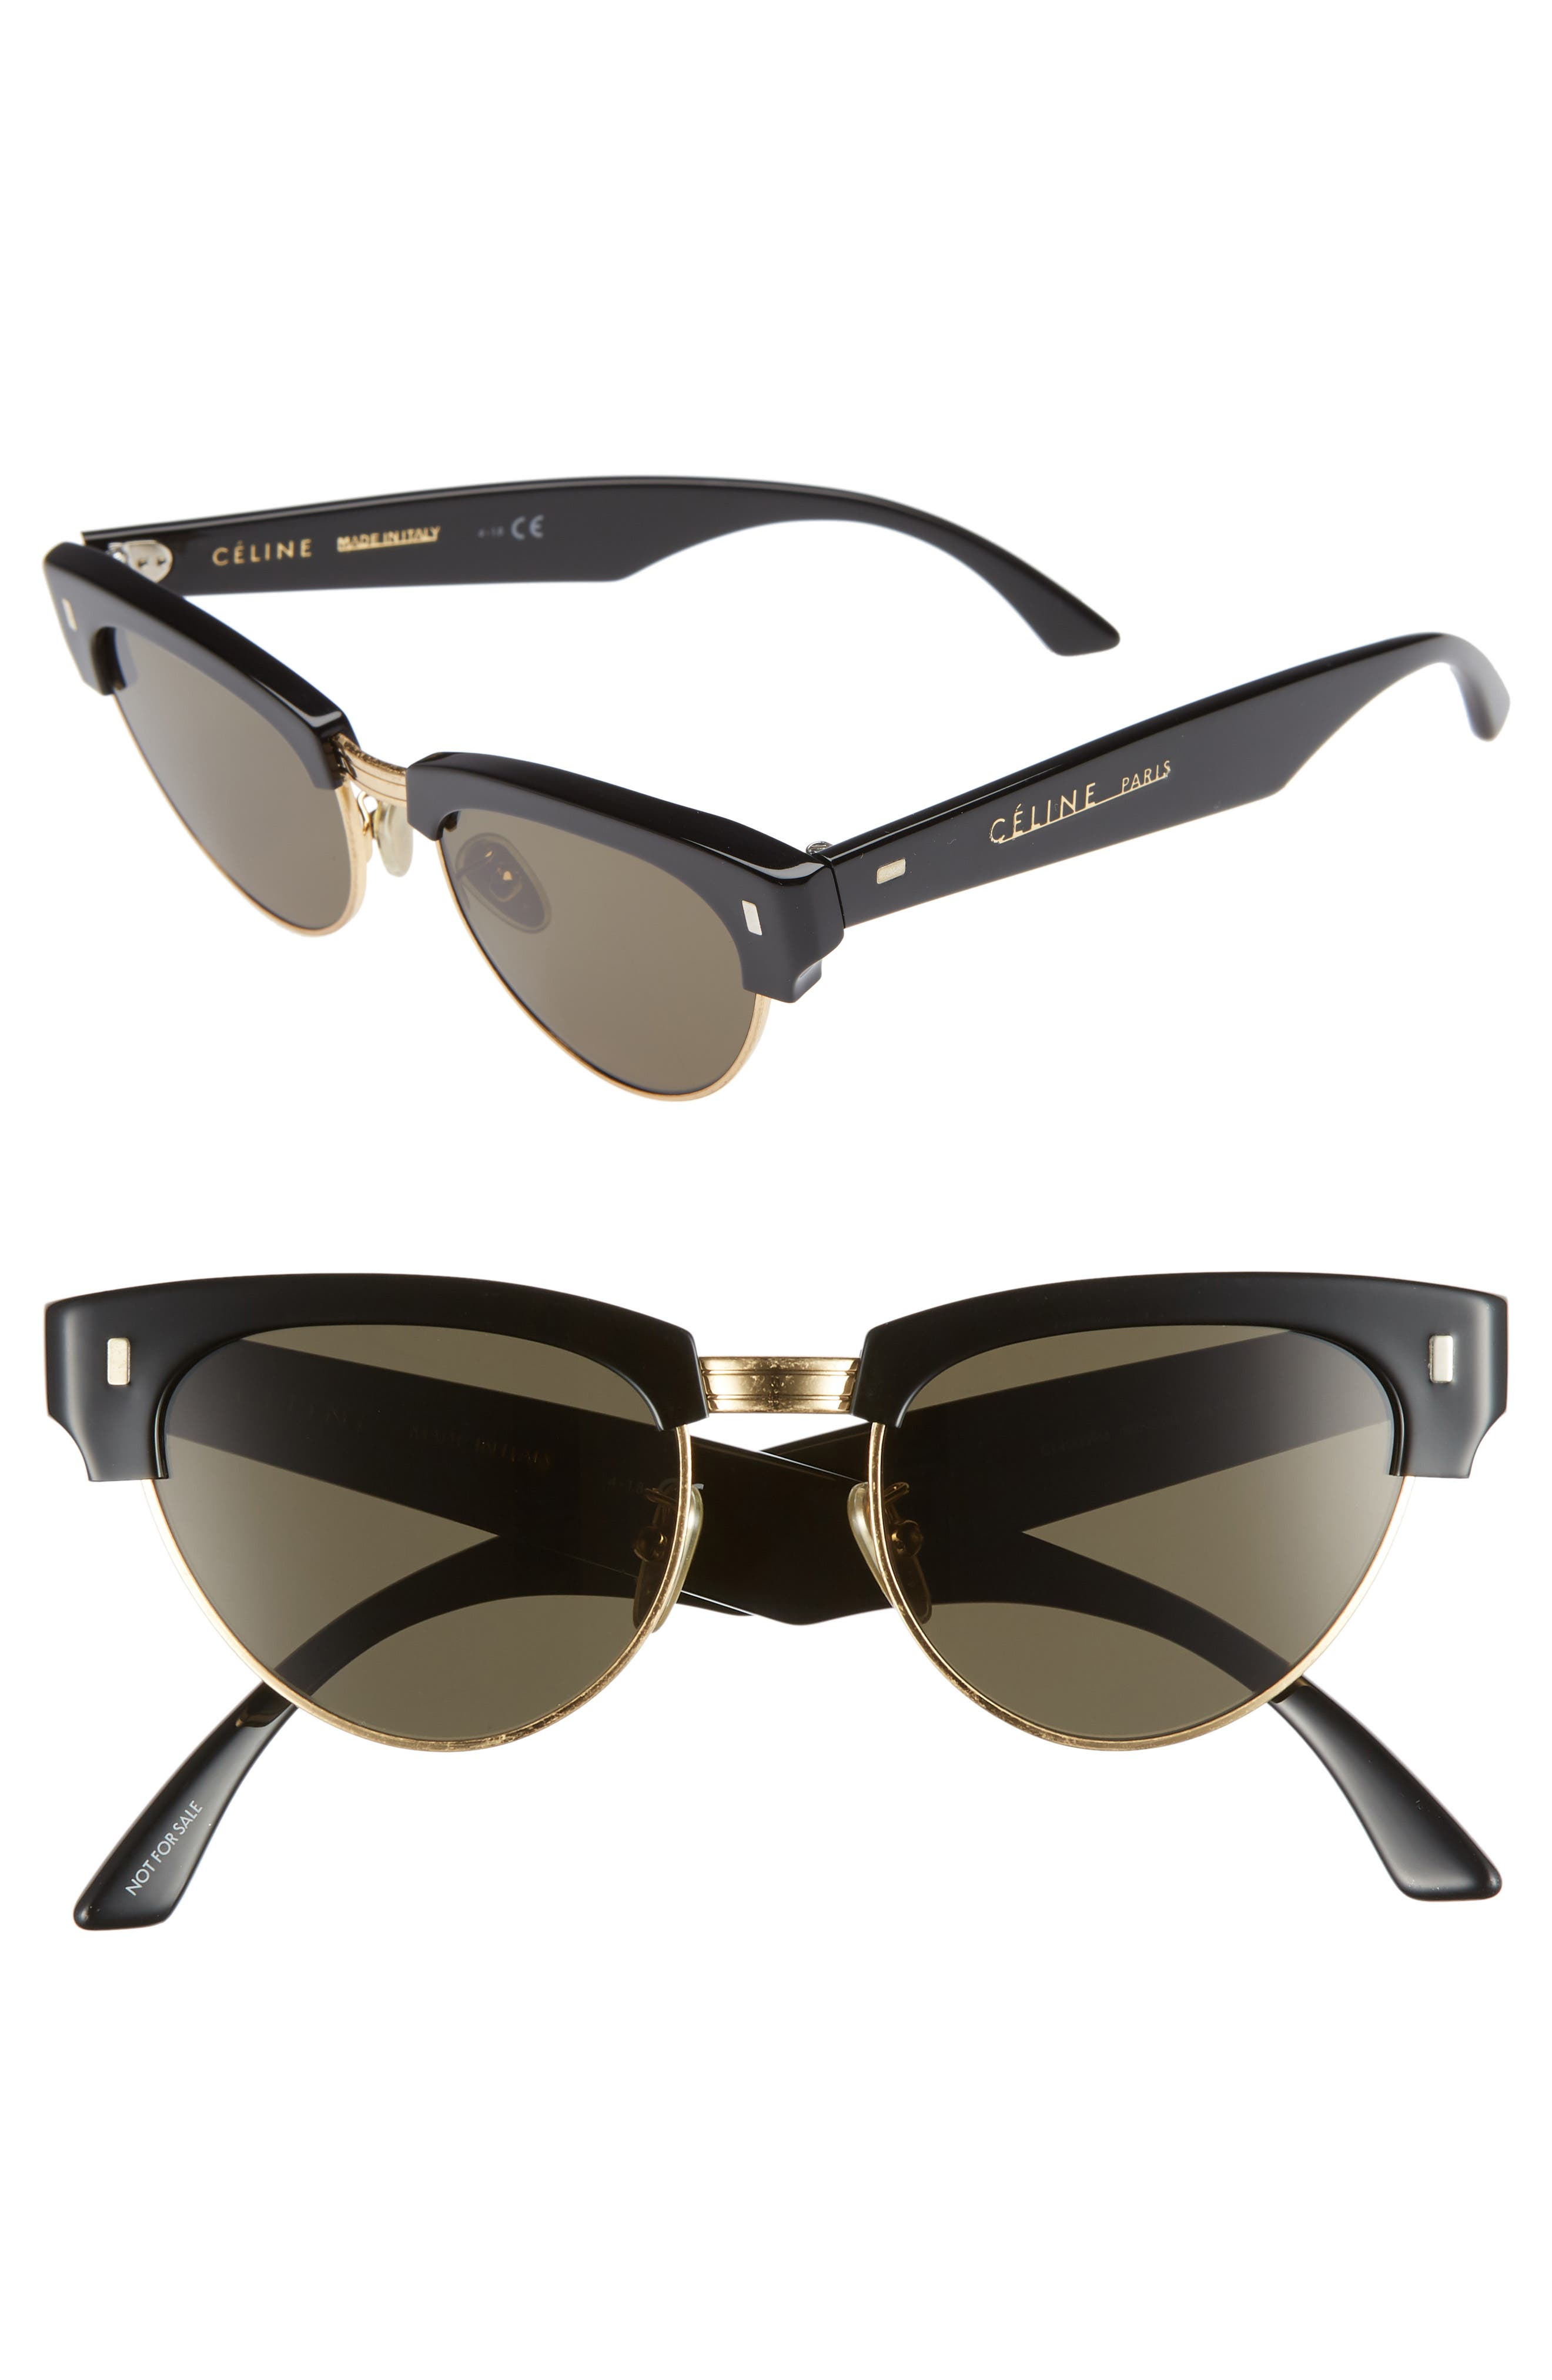 51Mm Modified Cat Eye Sunglasses - Black/ Mineral Lens